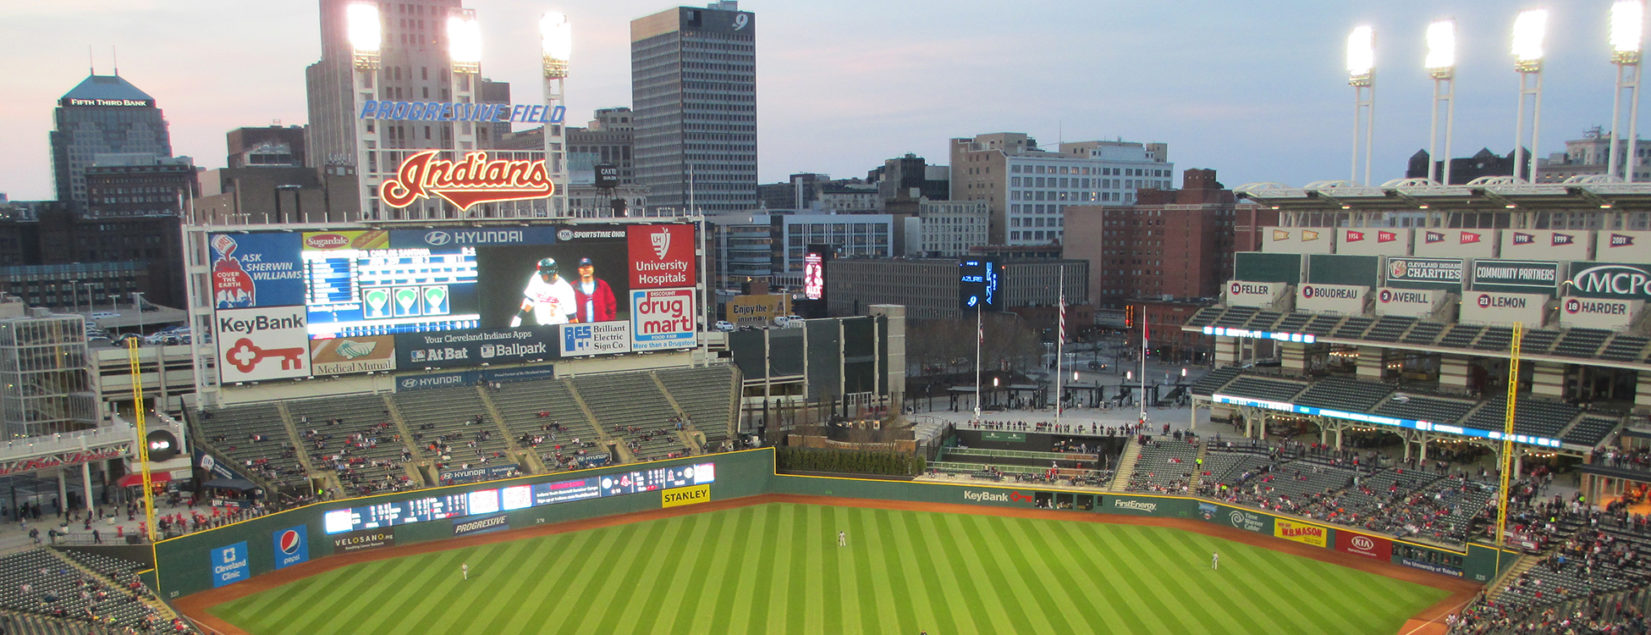 The Cleveland Indians Ballpark Progressive Field